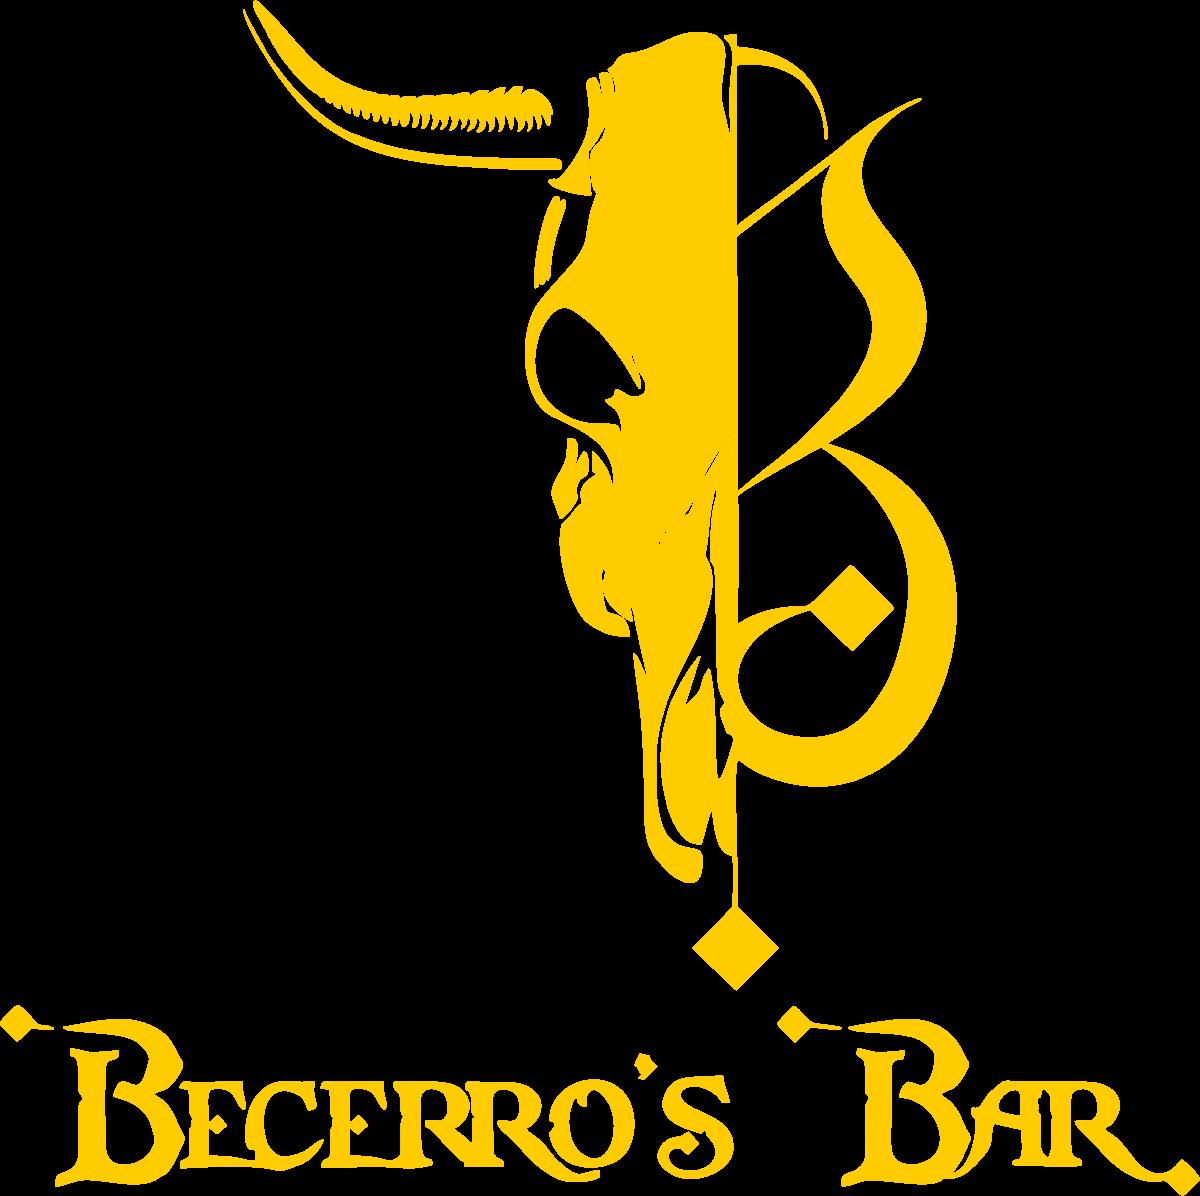 Becerros Bar Logo